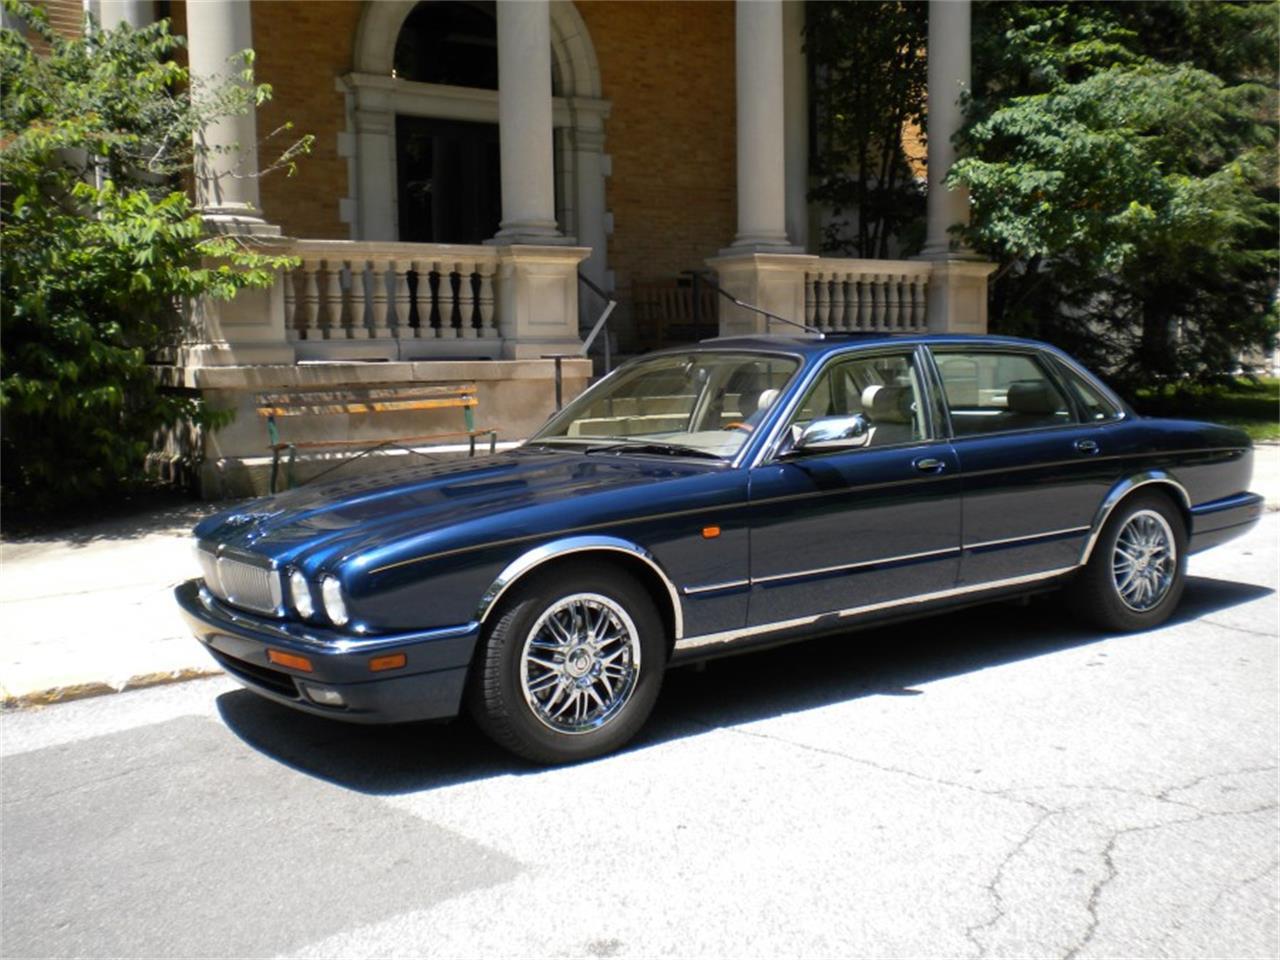 Car Dealers In Mishawaka >> 1995 Jaguar XJ6 for Sale | ClassicCars.com | CC-970726